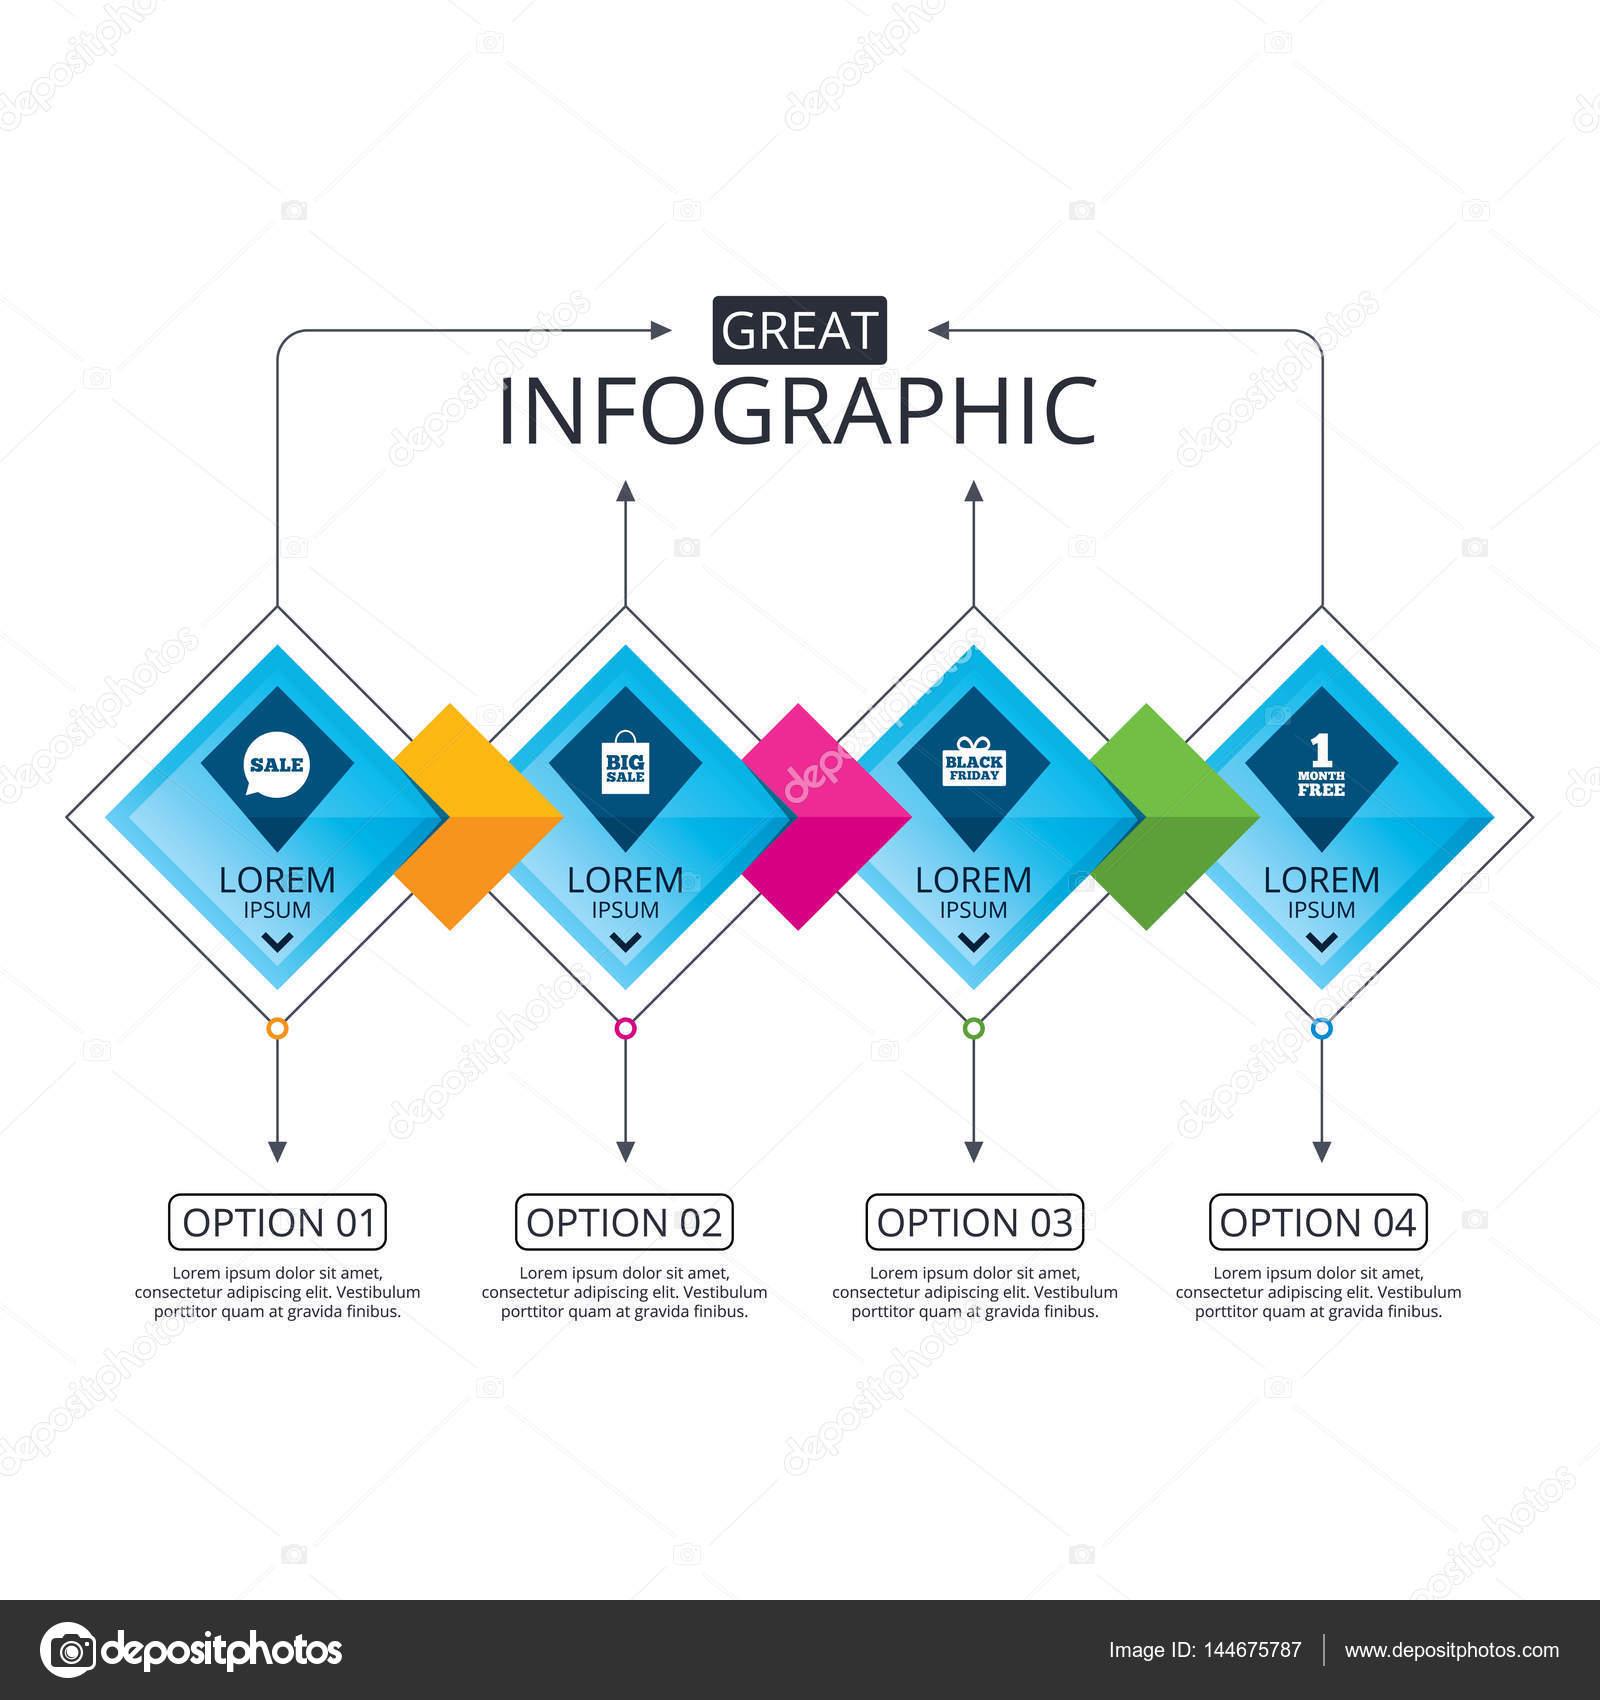 Infografik Flussdiagramm Vorlage — Stockvektor © Blankstock #144675787